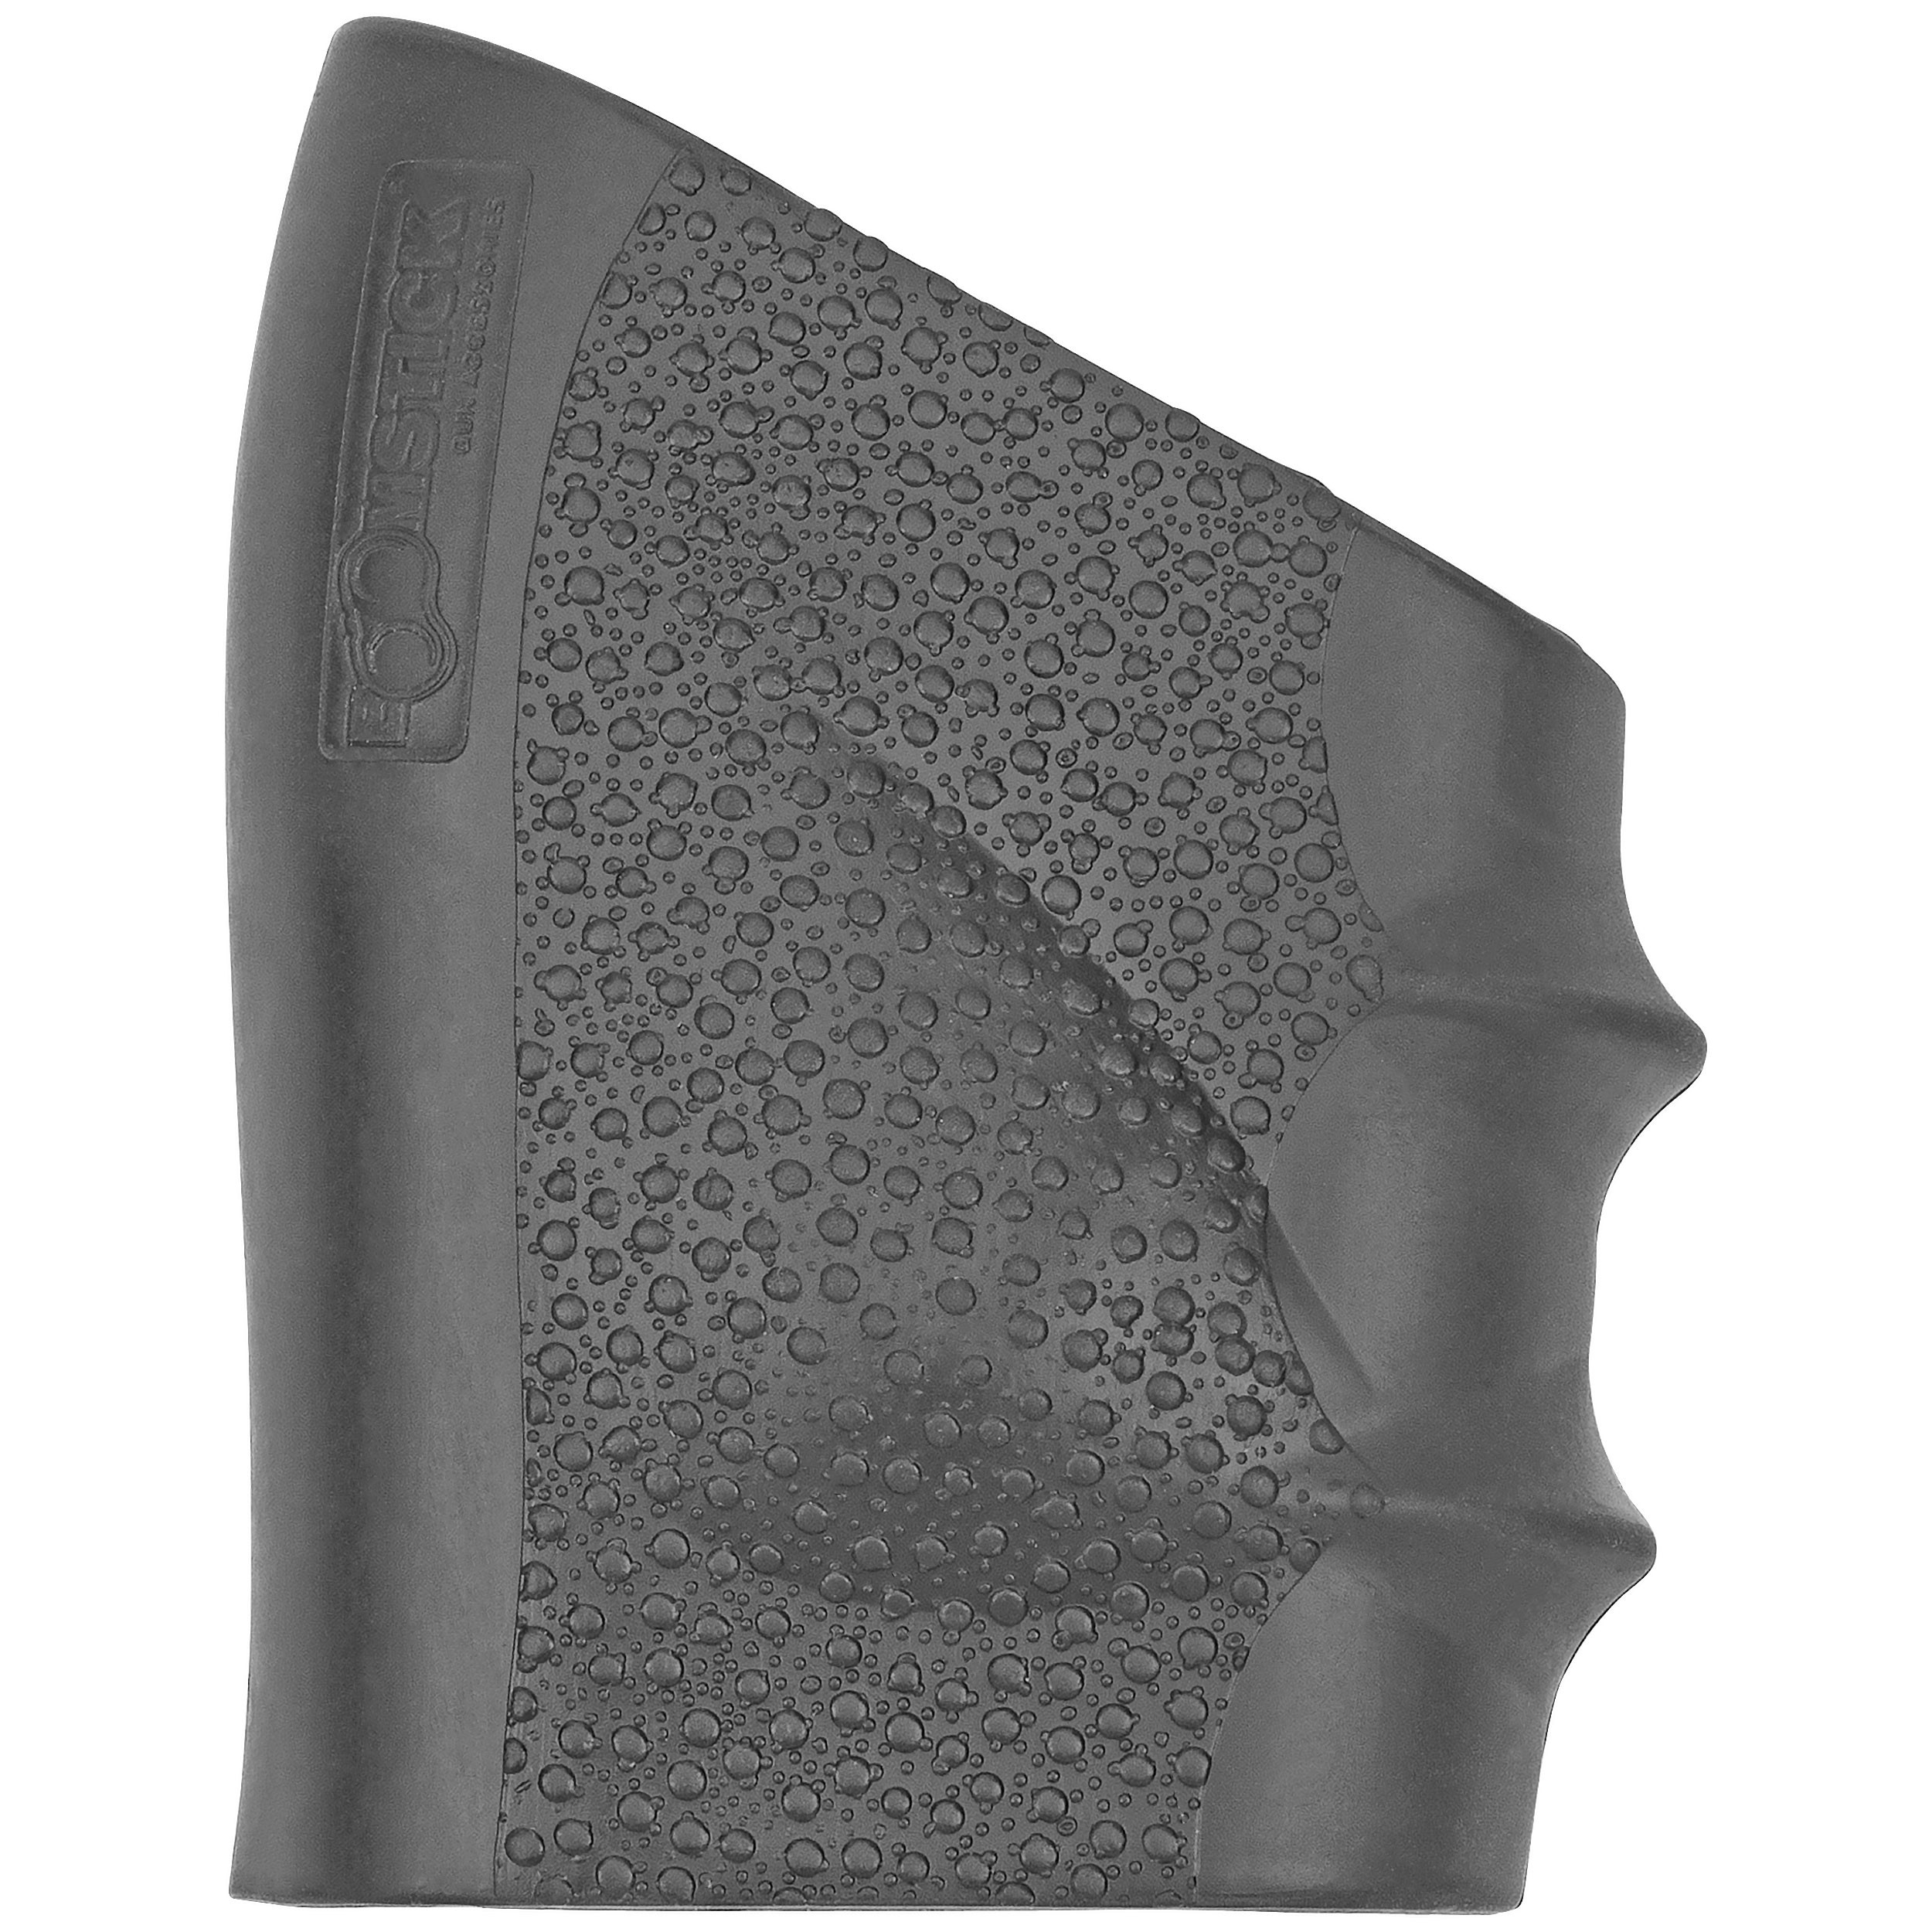 BOOMSTICK Universal Grip Glove Sleeve Fits Most Full Size Pistols Glock SW Sigma Sig Sauer Ruger, Black